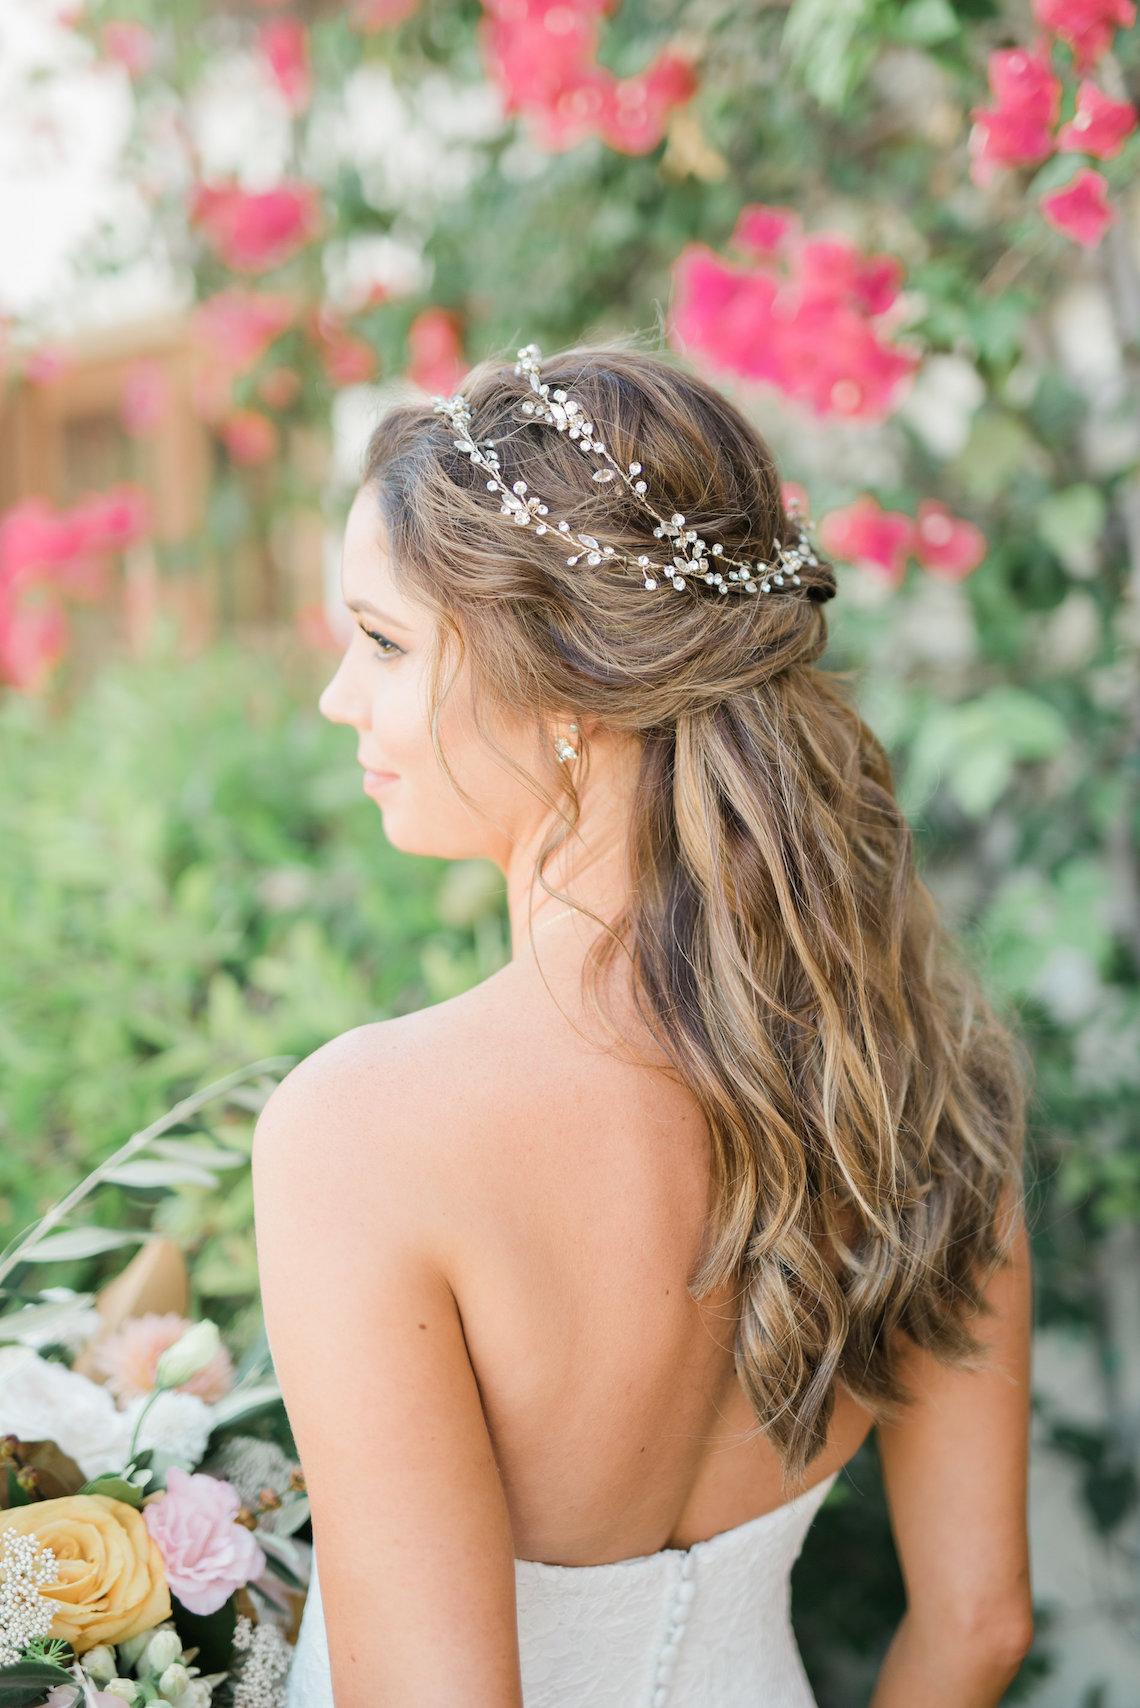 Upscale, Modern Ranch Wedding | Anya Kernes Photography 22